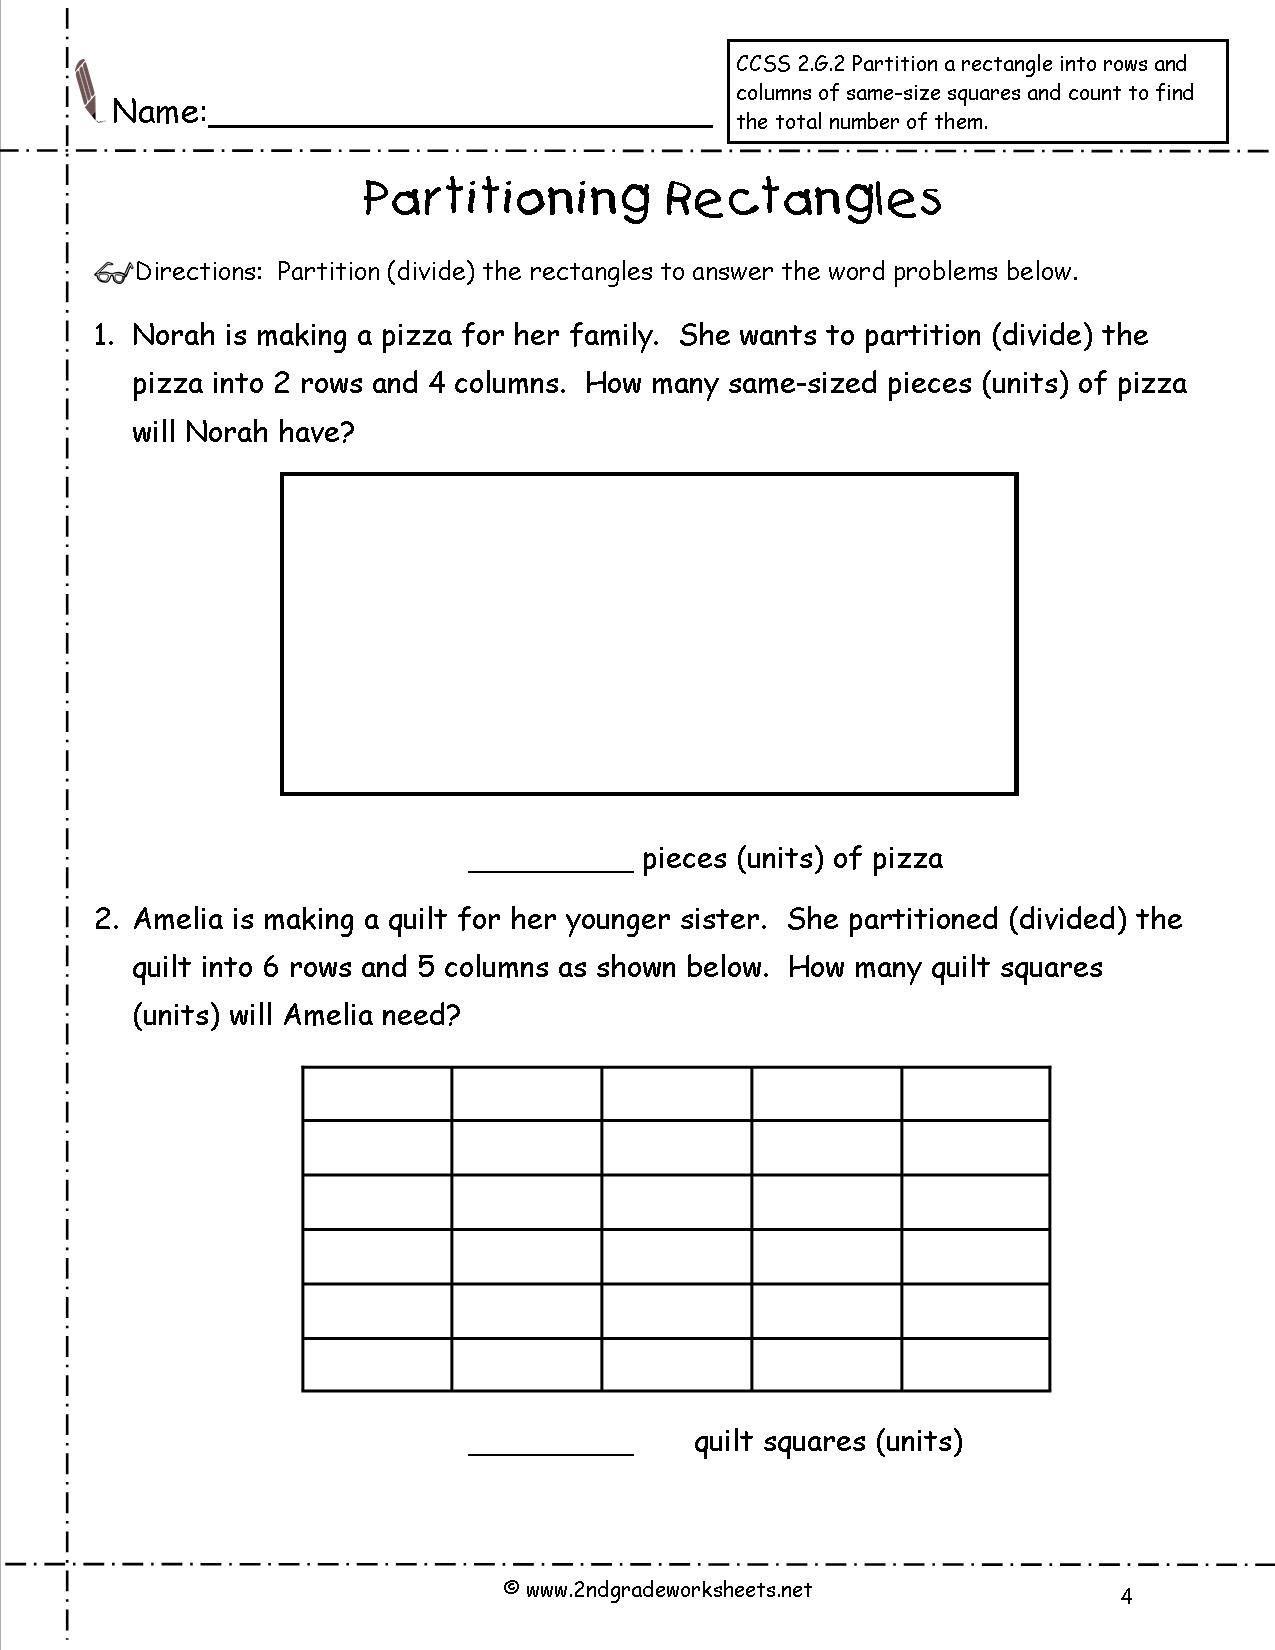 Pin On 2nd Grade Math Worksheets